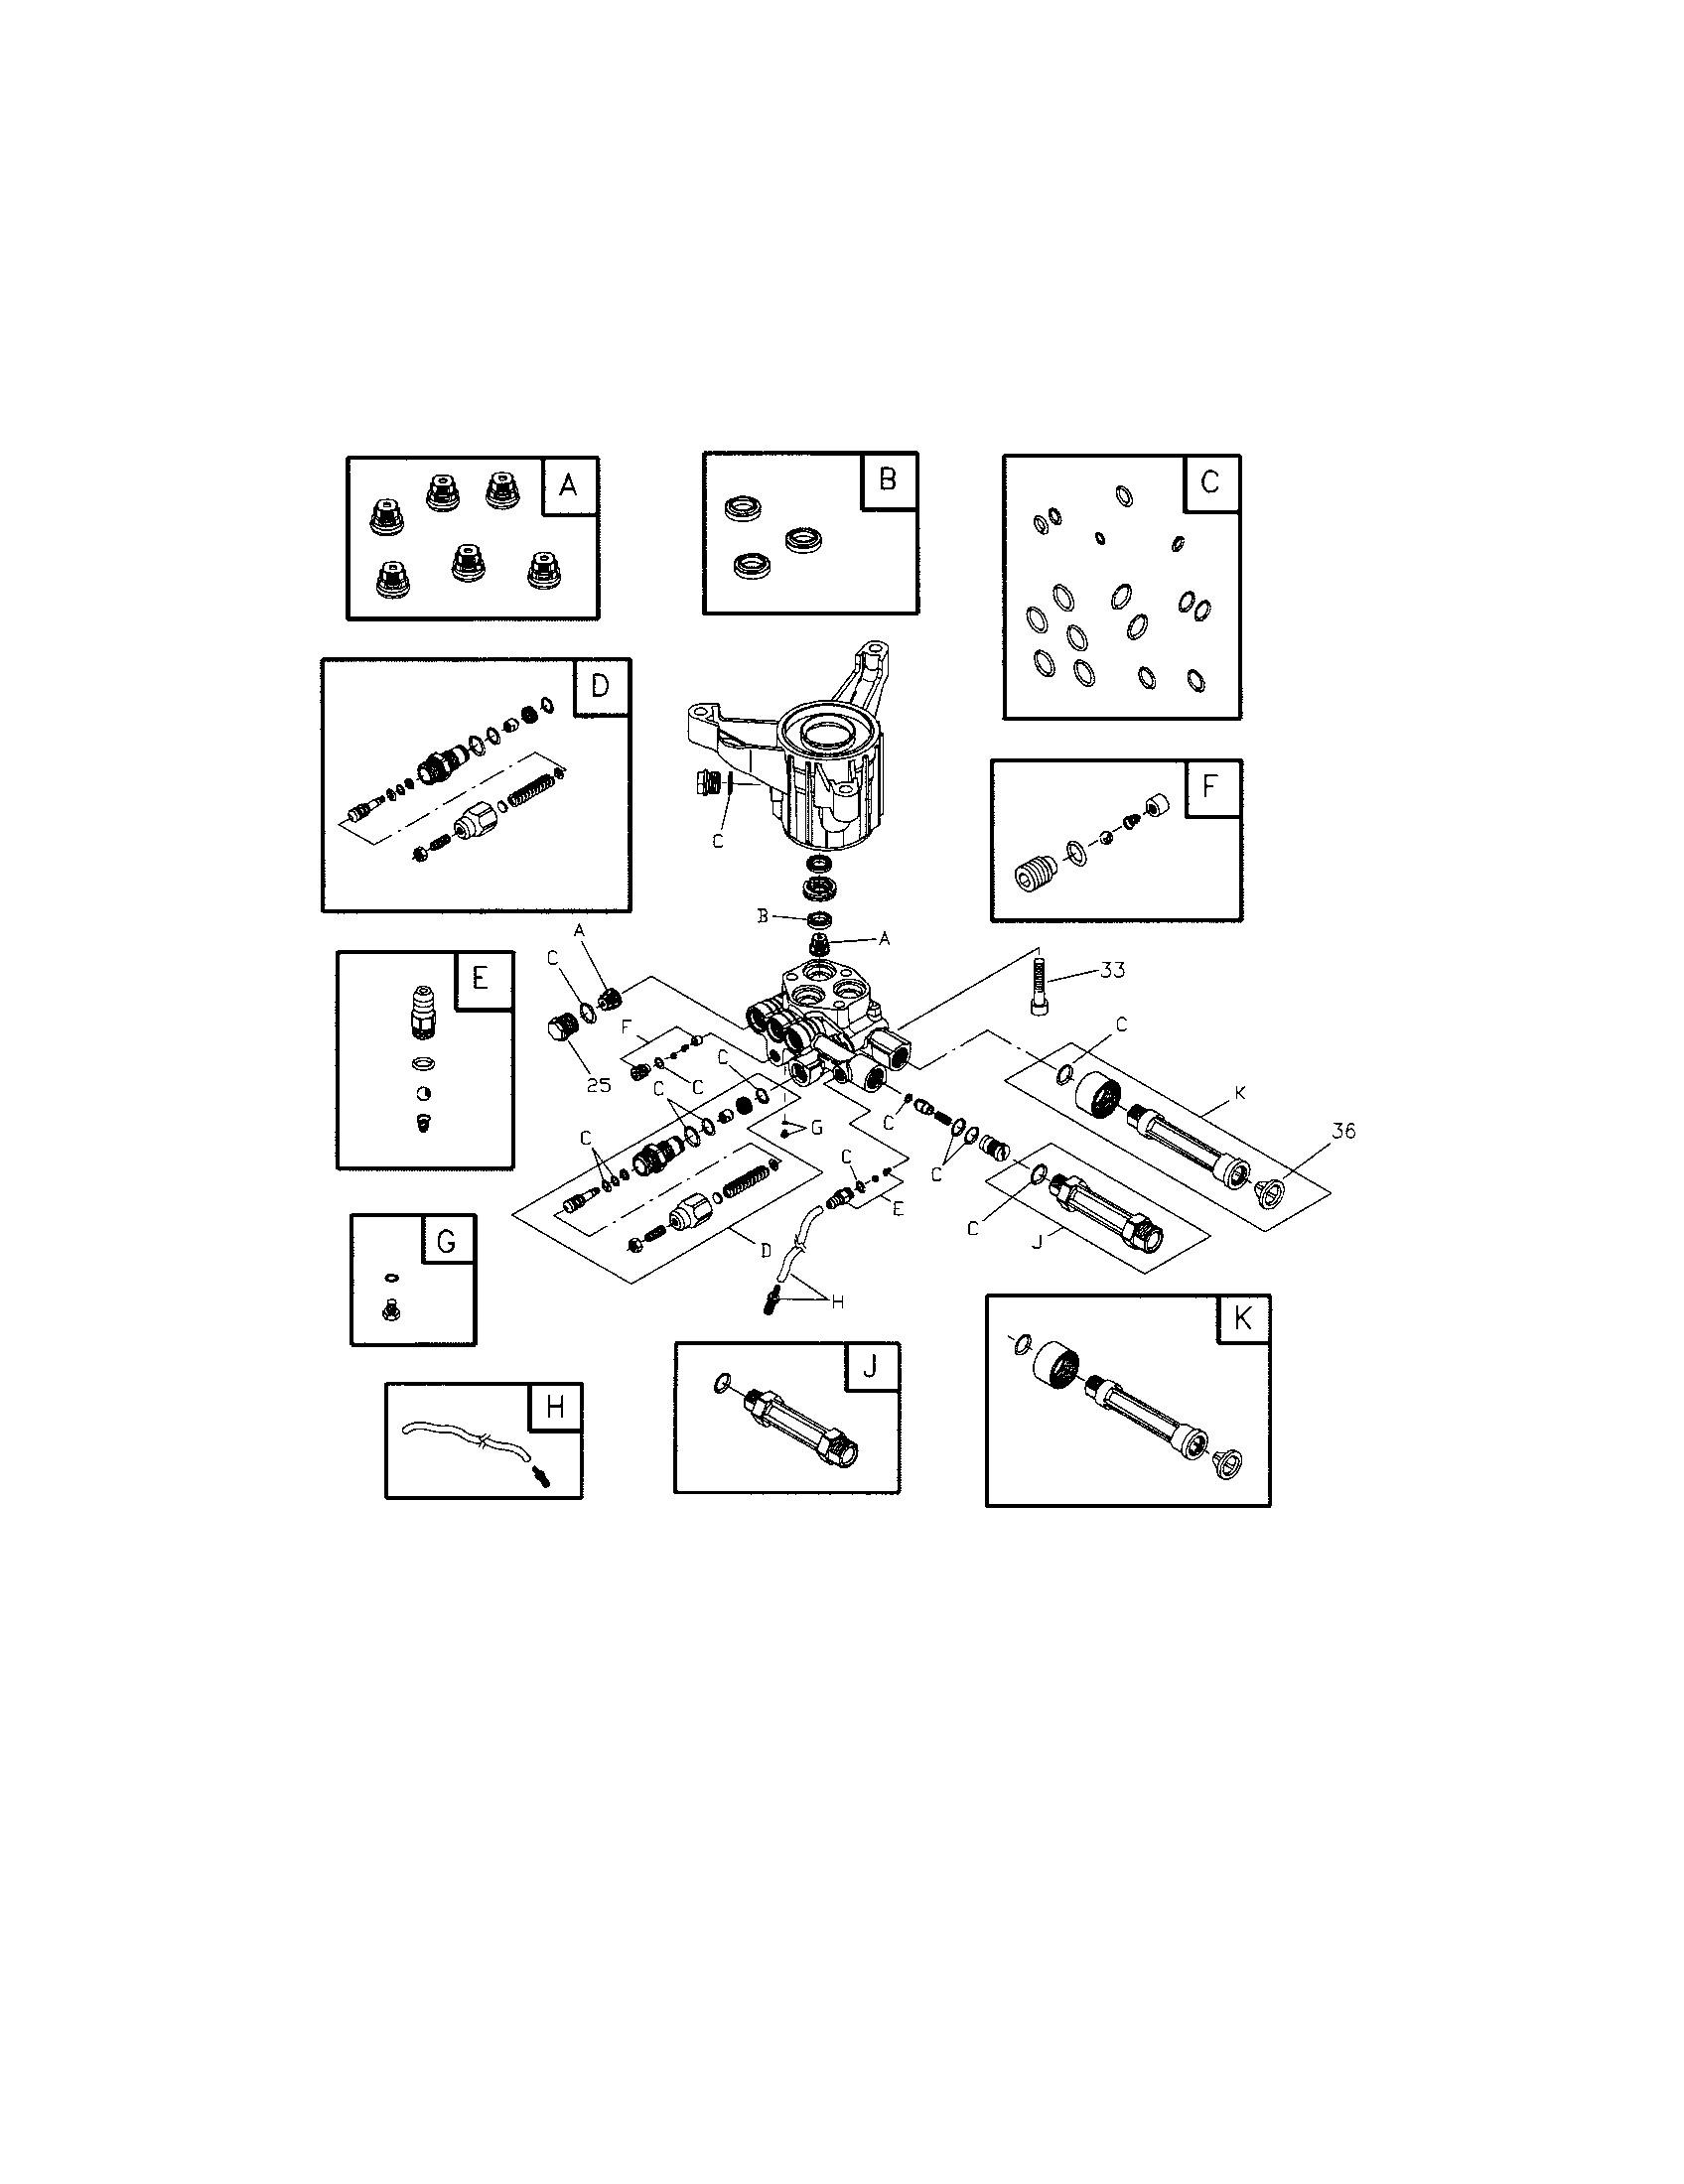 Briggs and Stratton Parts Diagram Snapper 00 Spx2348 48